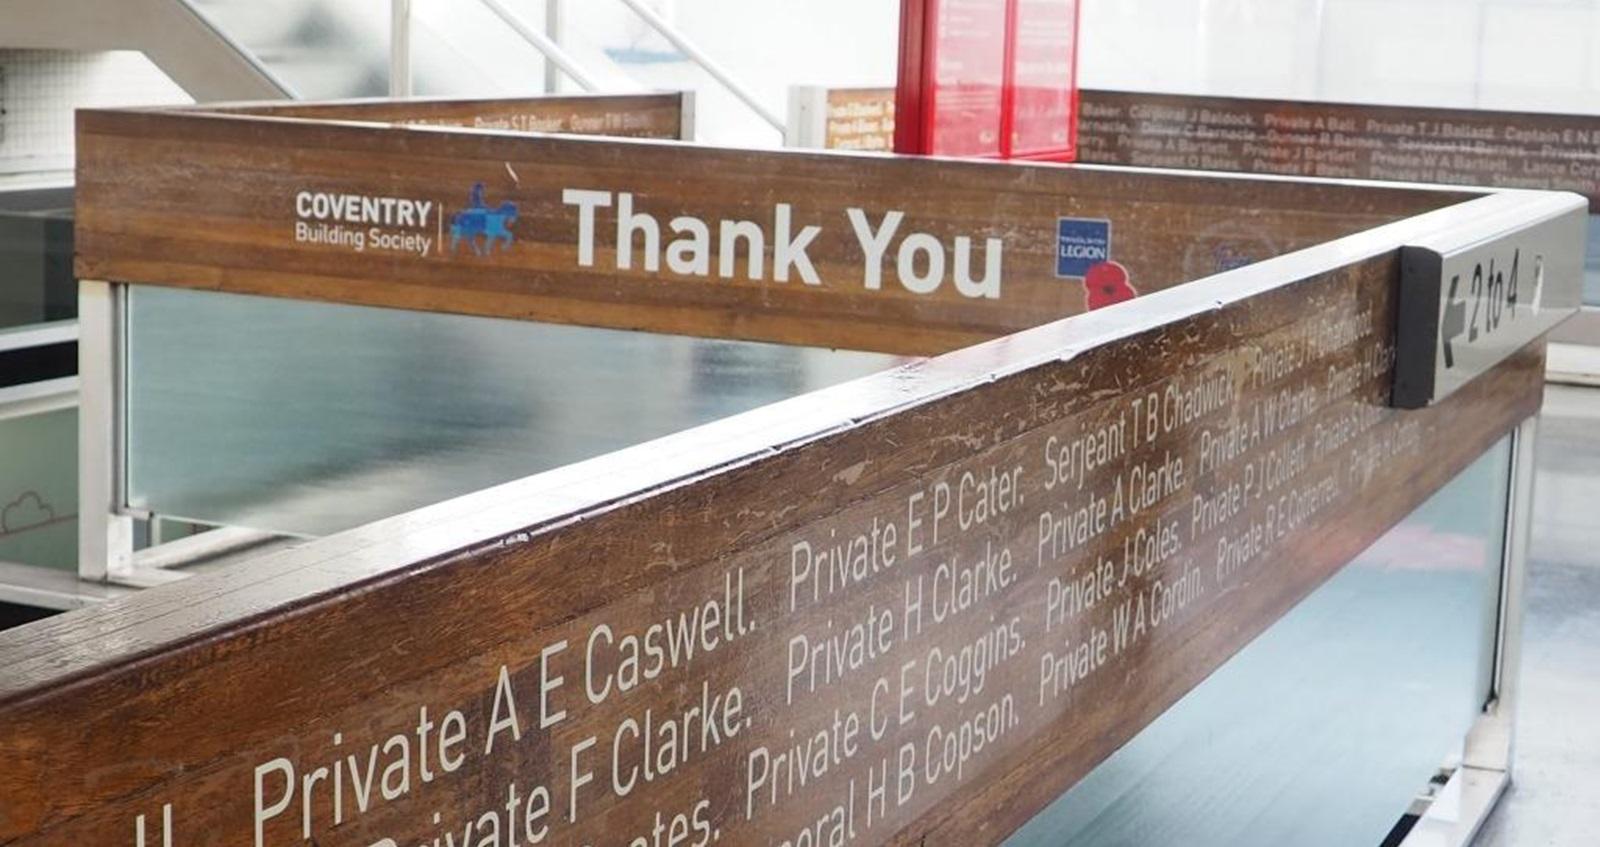 Coventry Building Society partnership – Inside the Coventy Building Society building